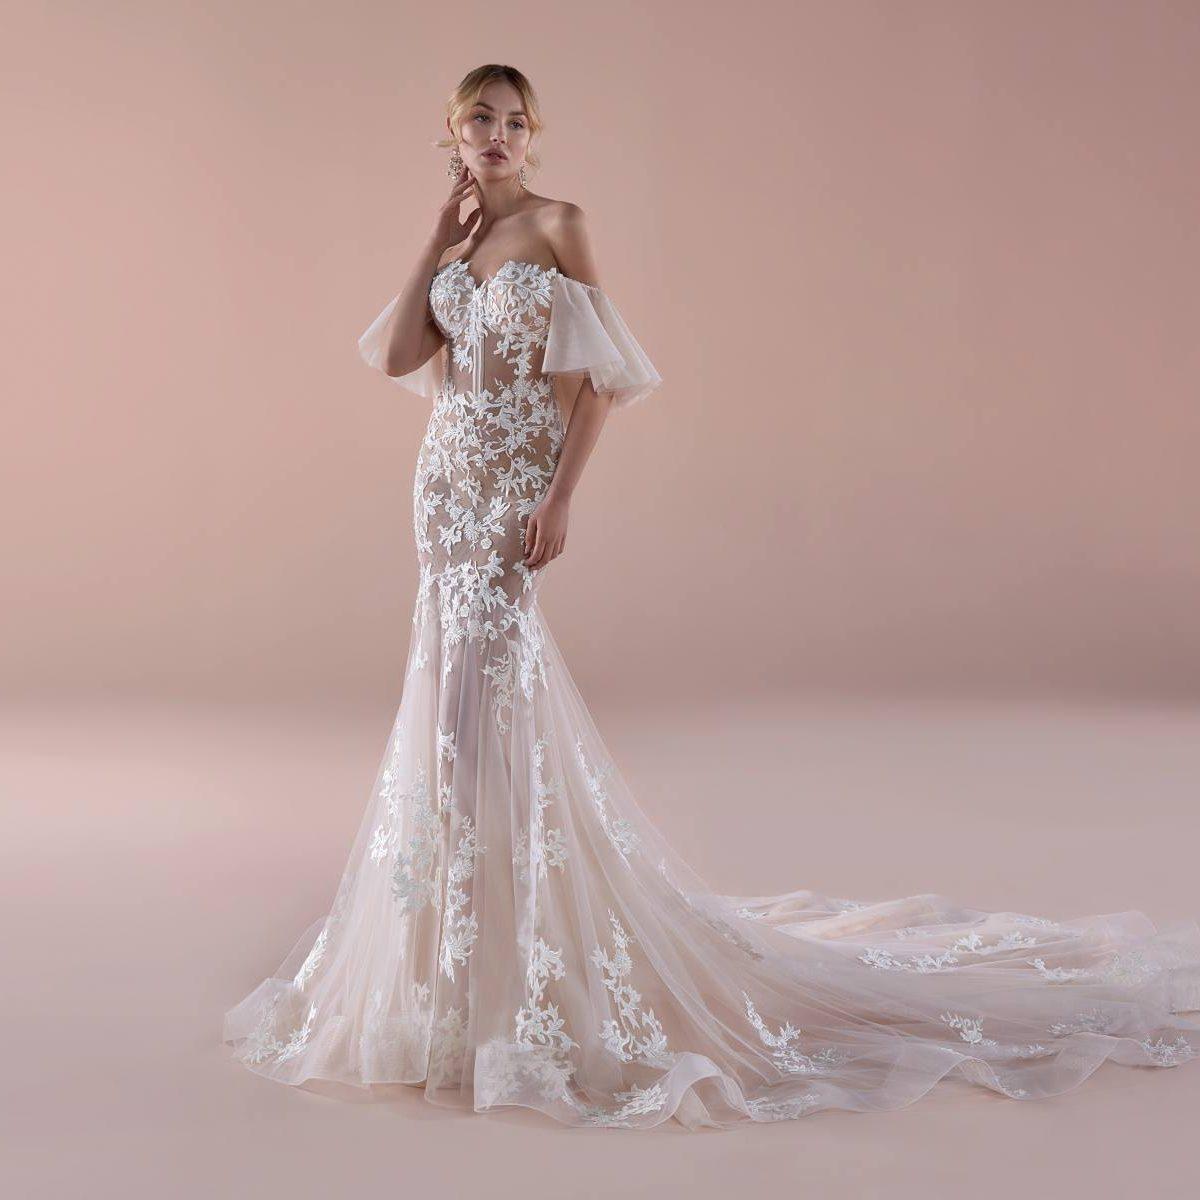 Elizabeth-Bridal-Romance-20211